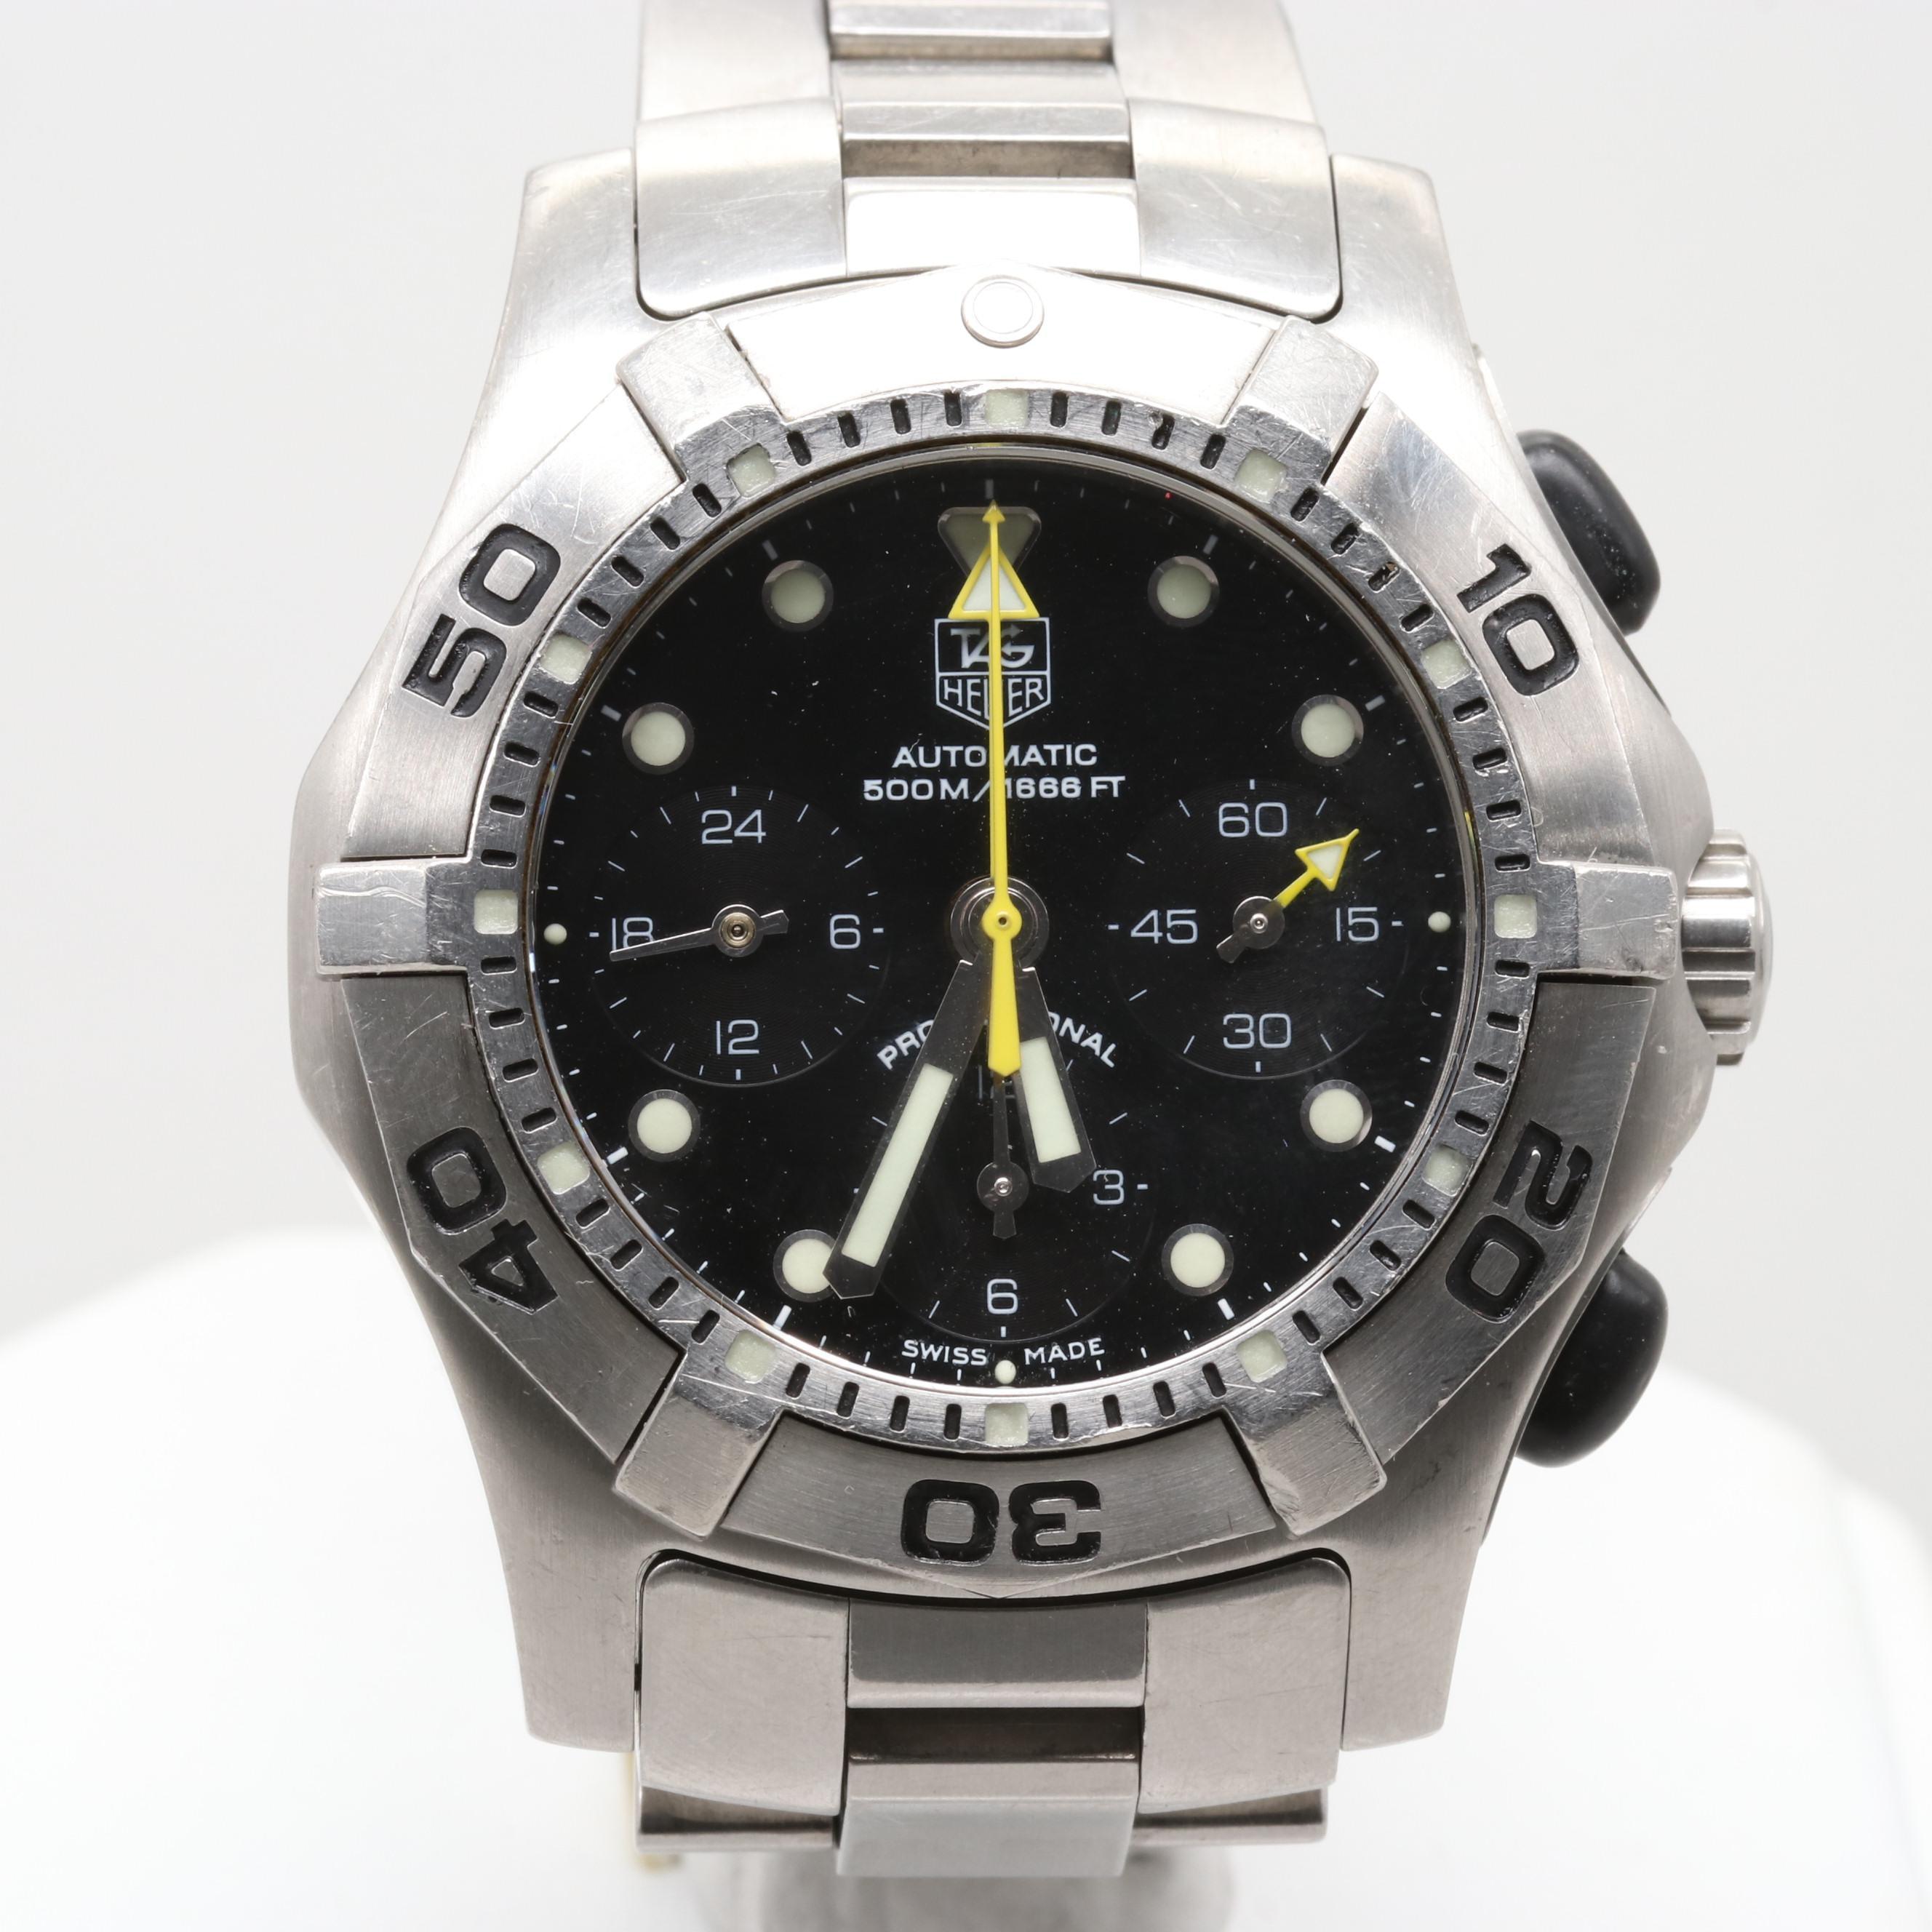 TAG Heuer 2000 Auquagraph Automatic Chronograph Wristwatch